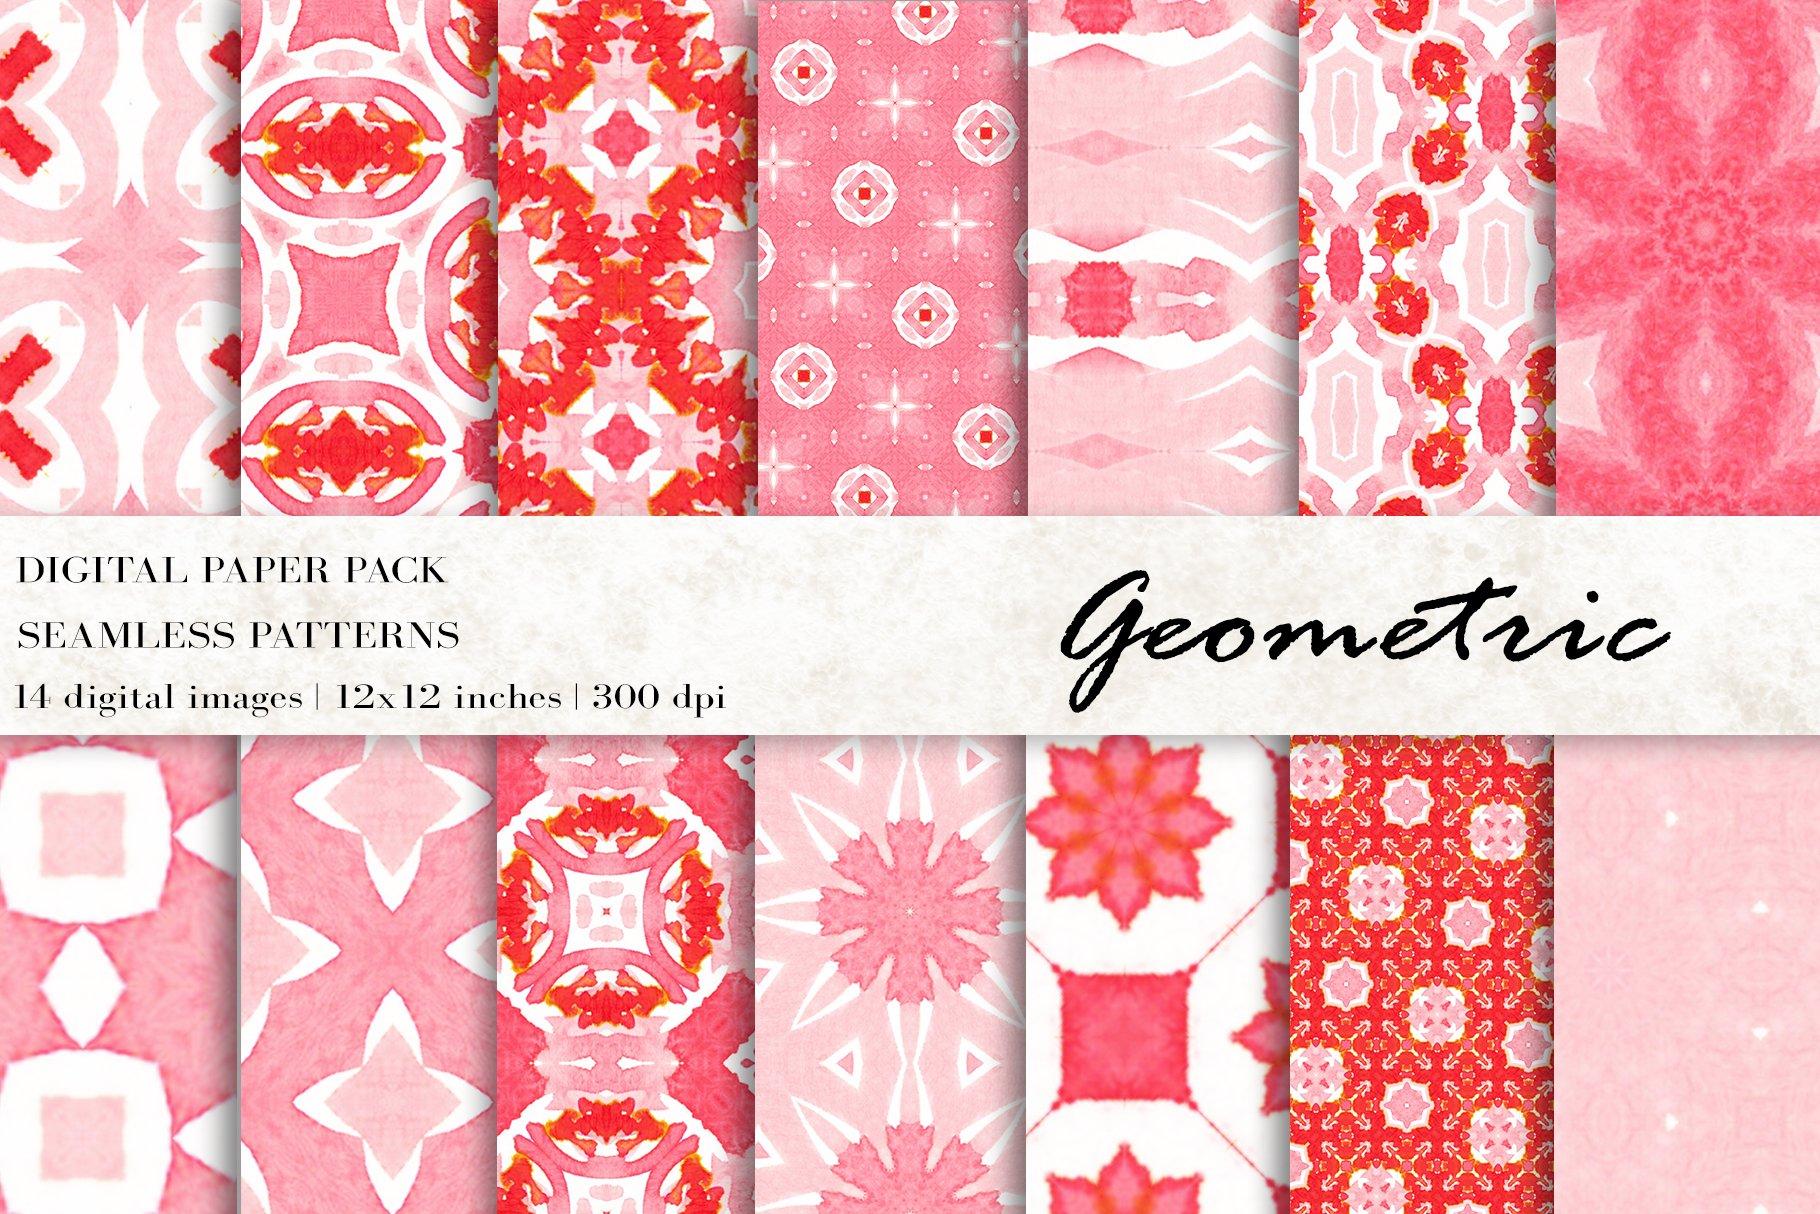 Digital paper Planner Printable Geometric Florals Seamless Backgrounds Bundle 65 digital pattern backgrounds,